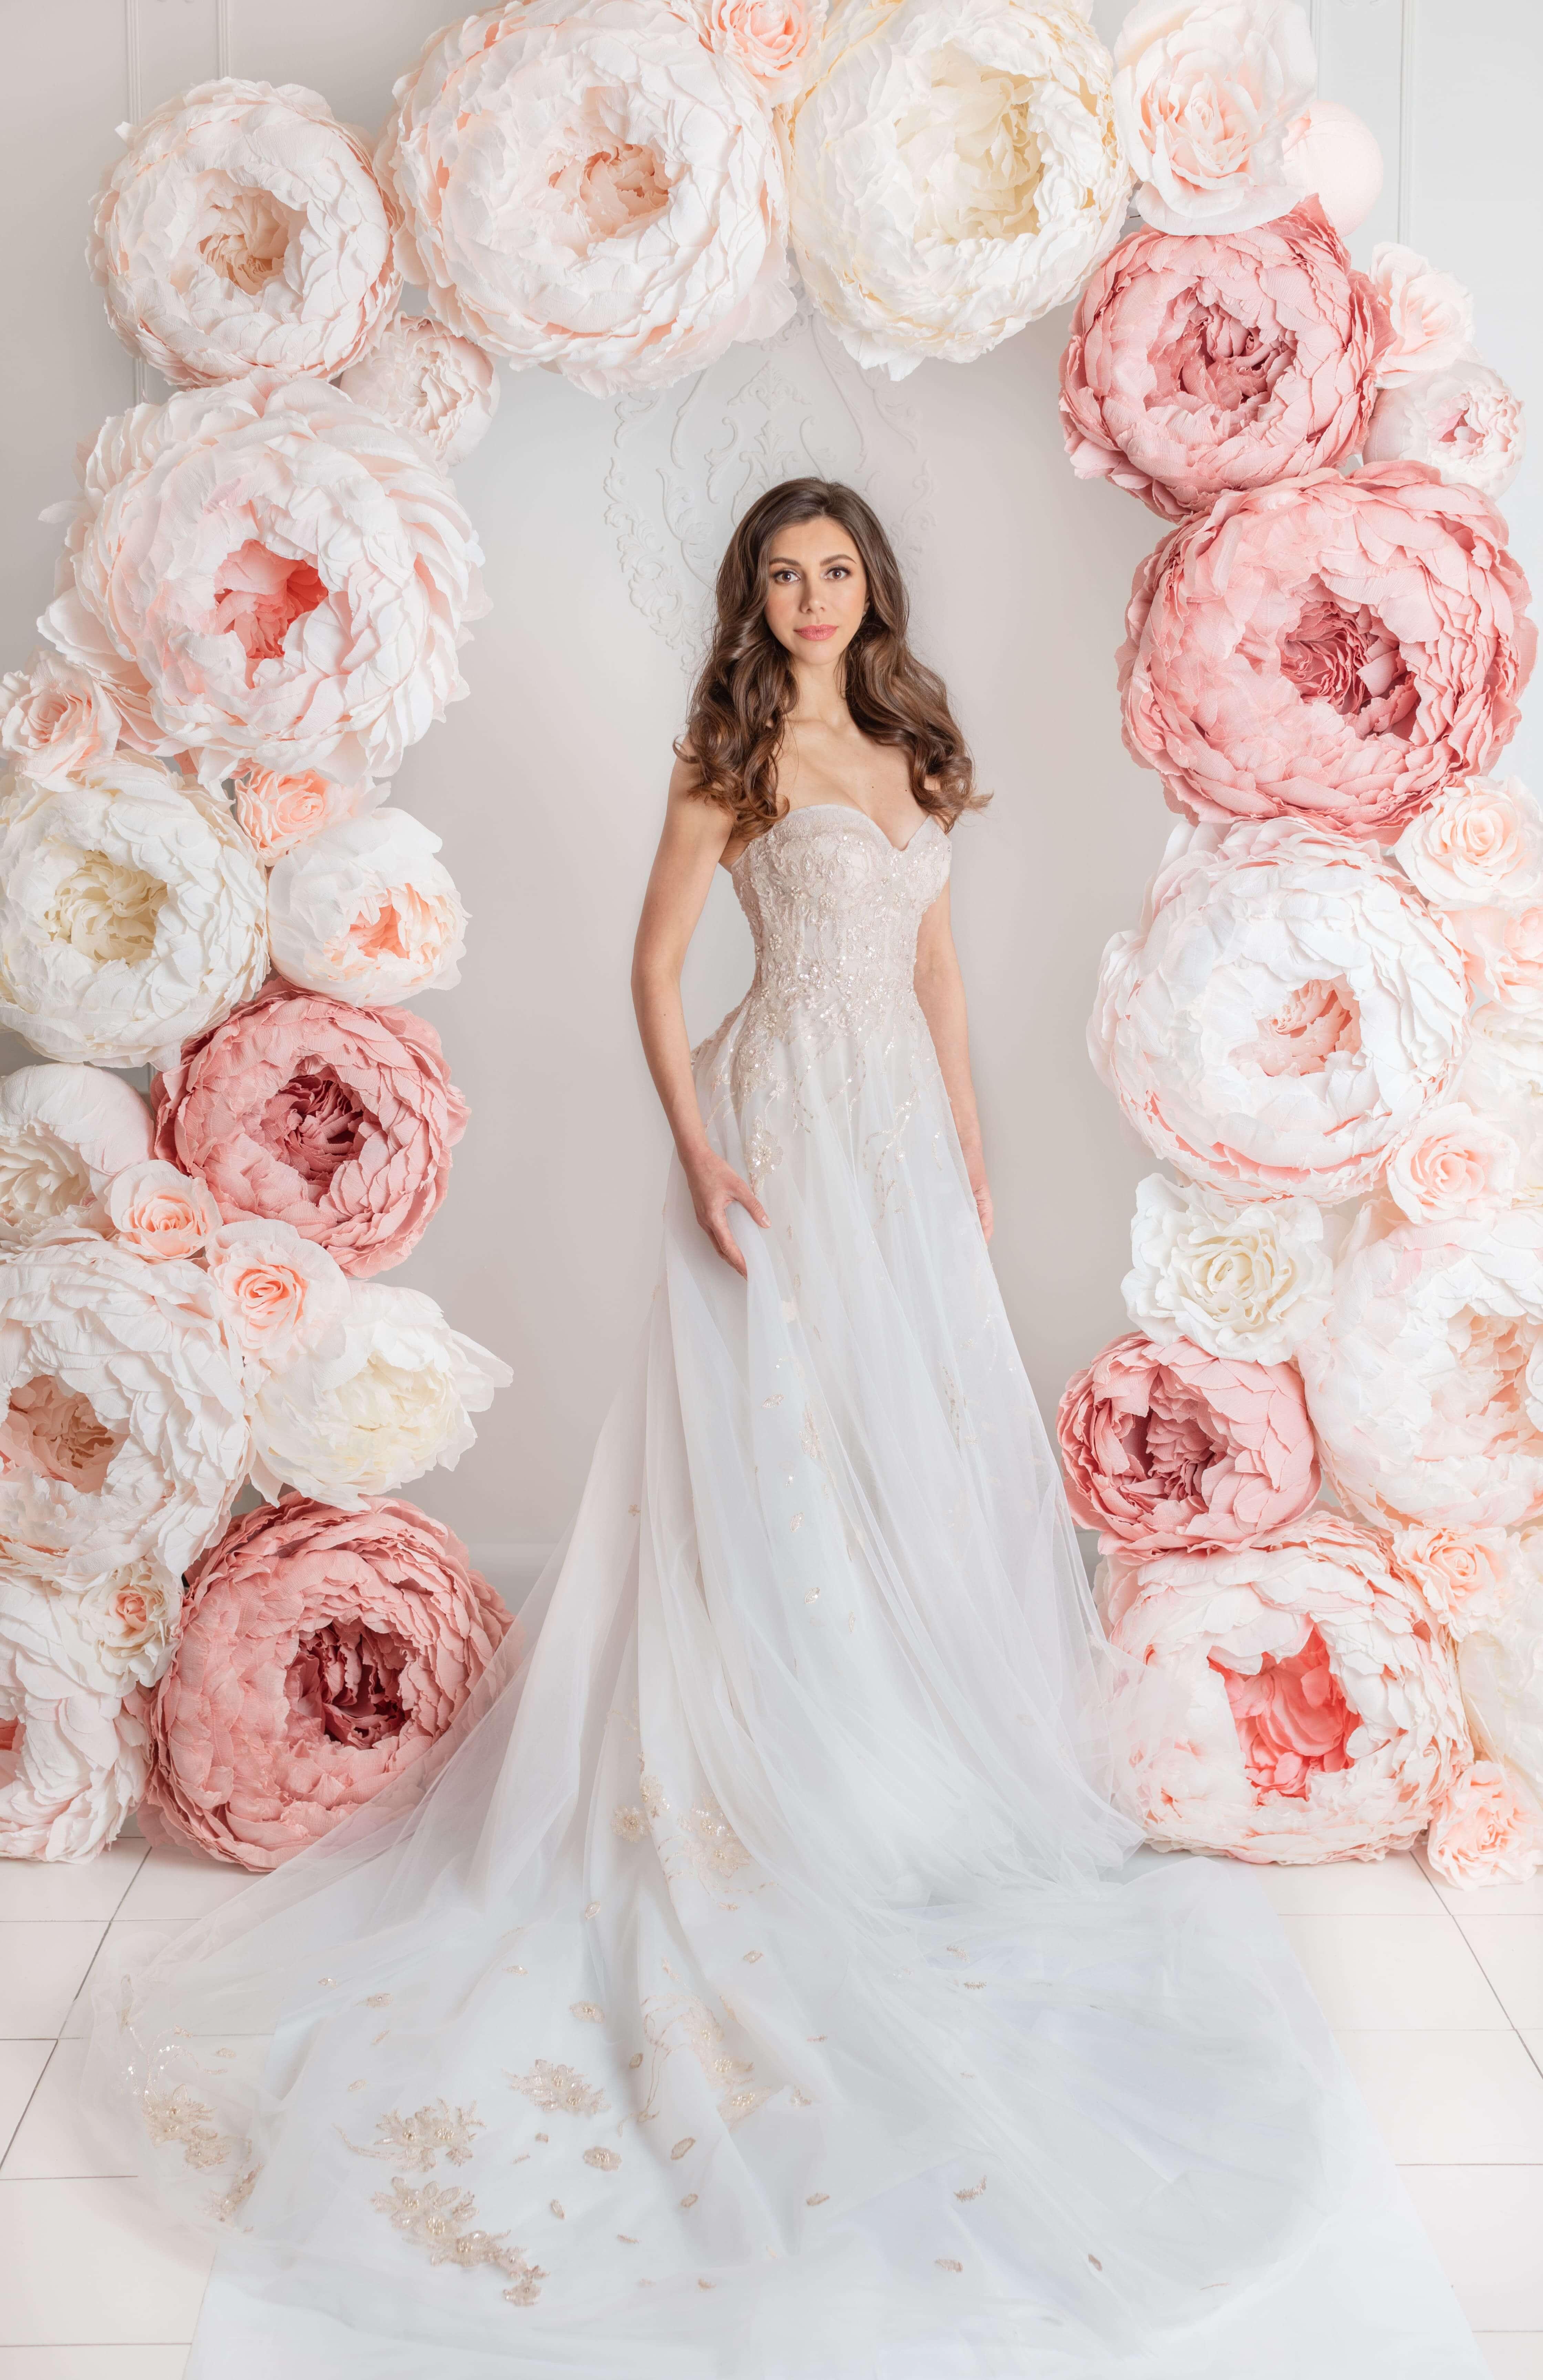 lilia haute couture montreal wedding dresses princess wedding gown